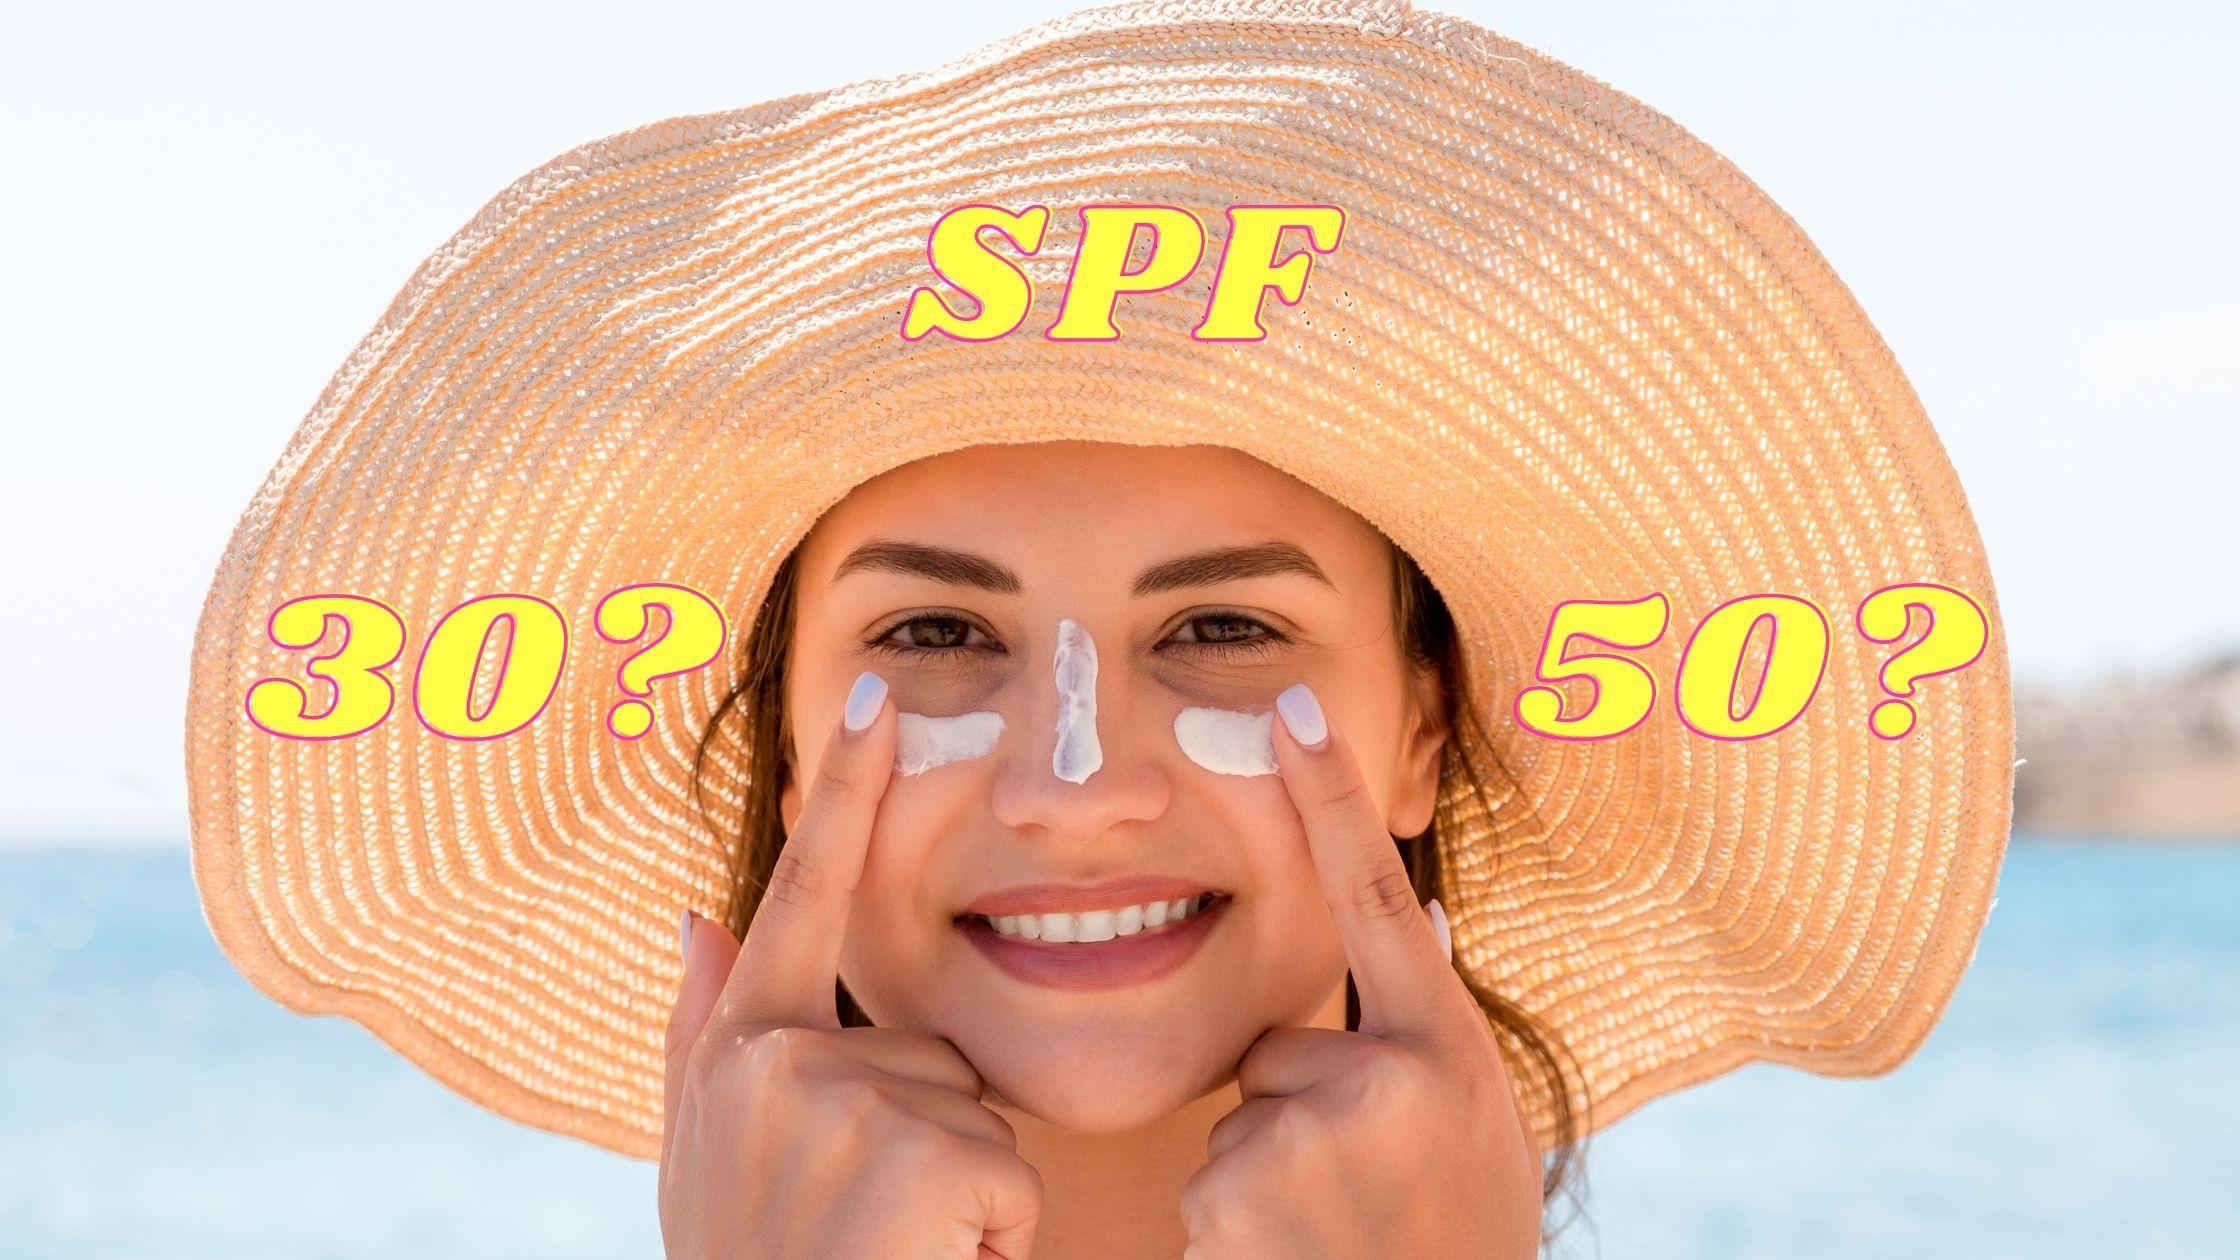 Jaki filtr SPF stosować latem - SPF 30 czy SPF 50?